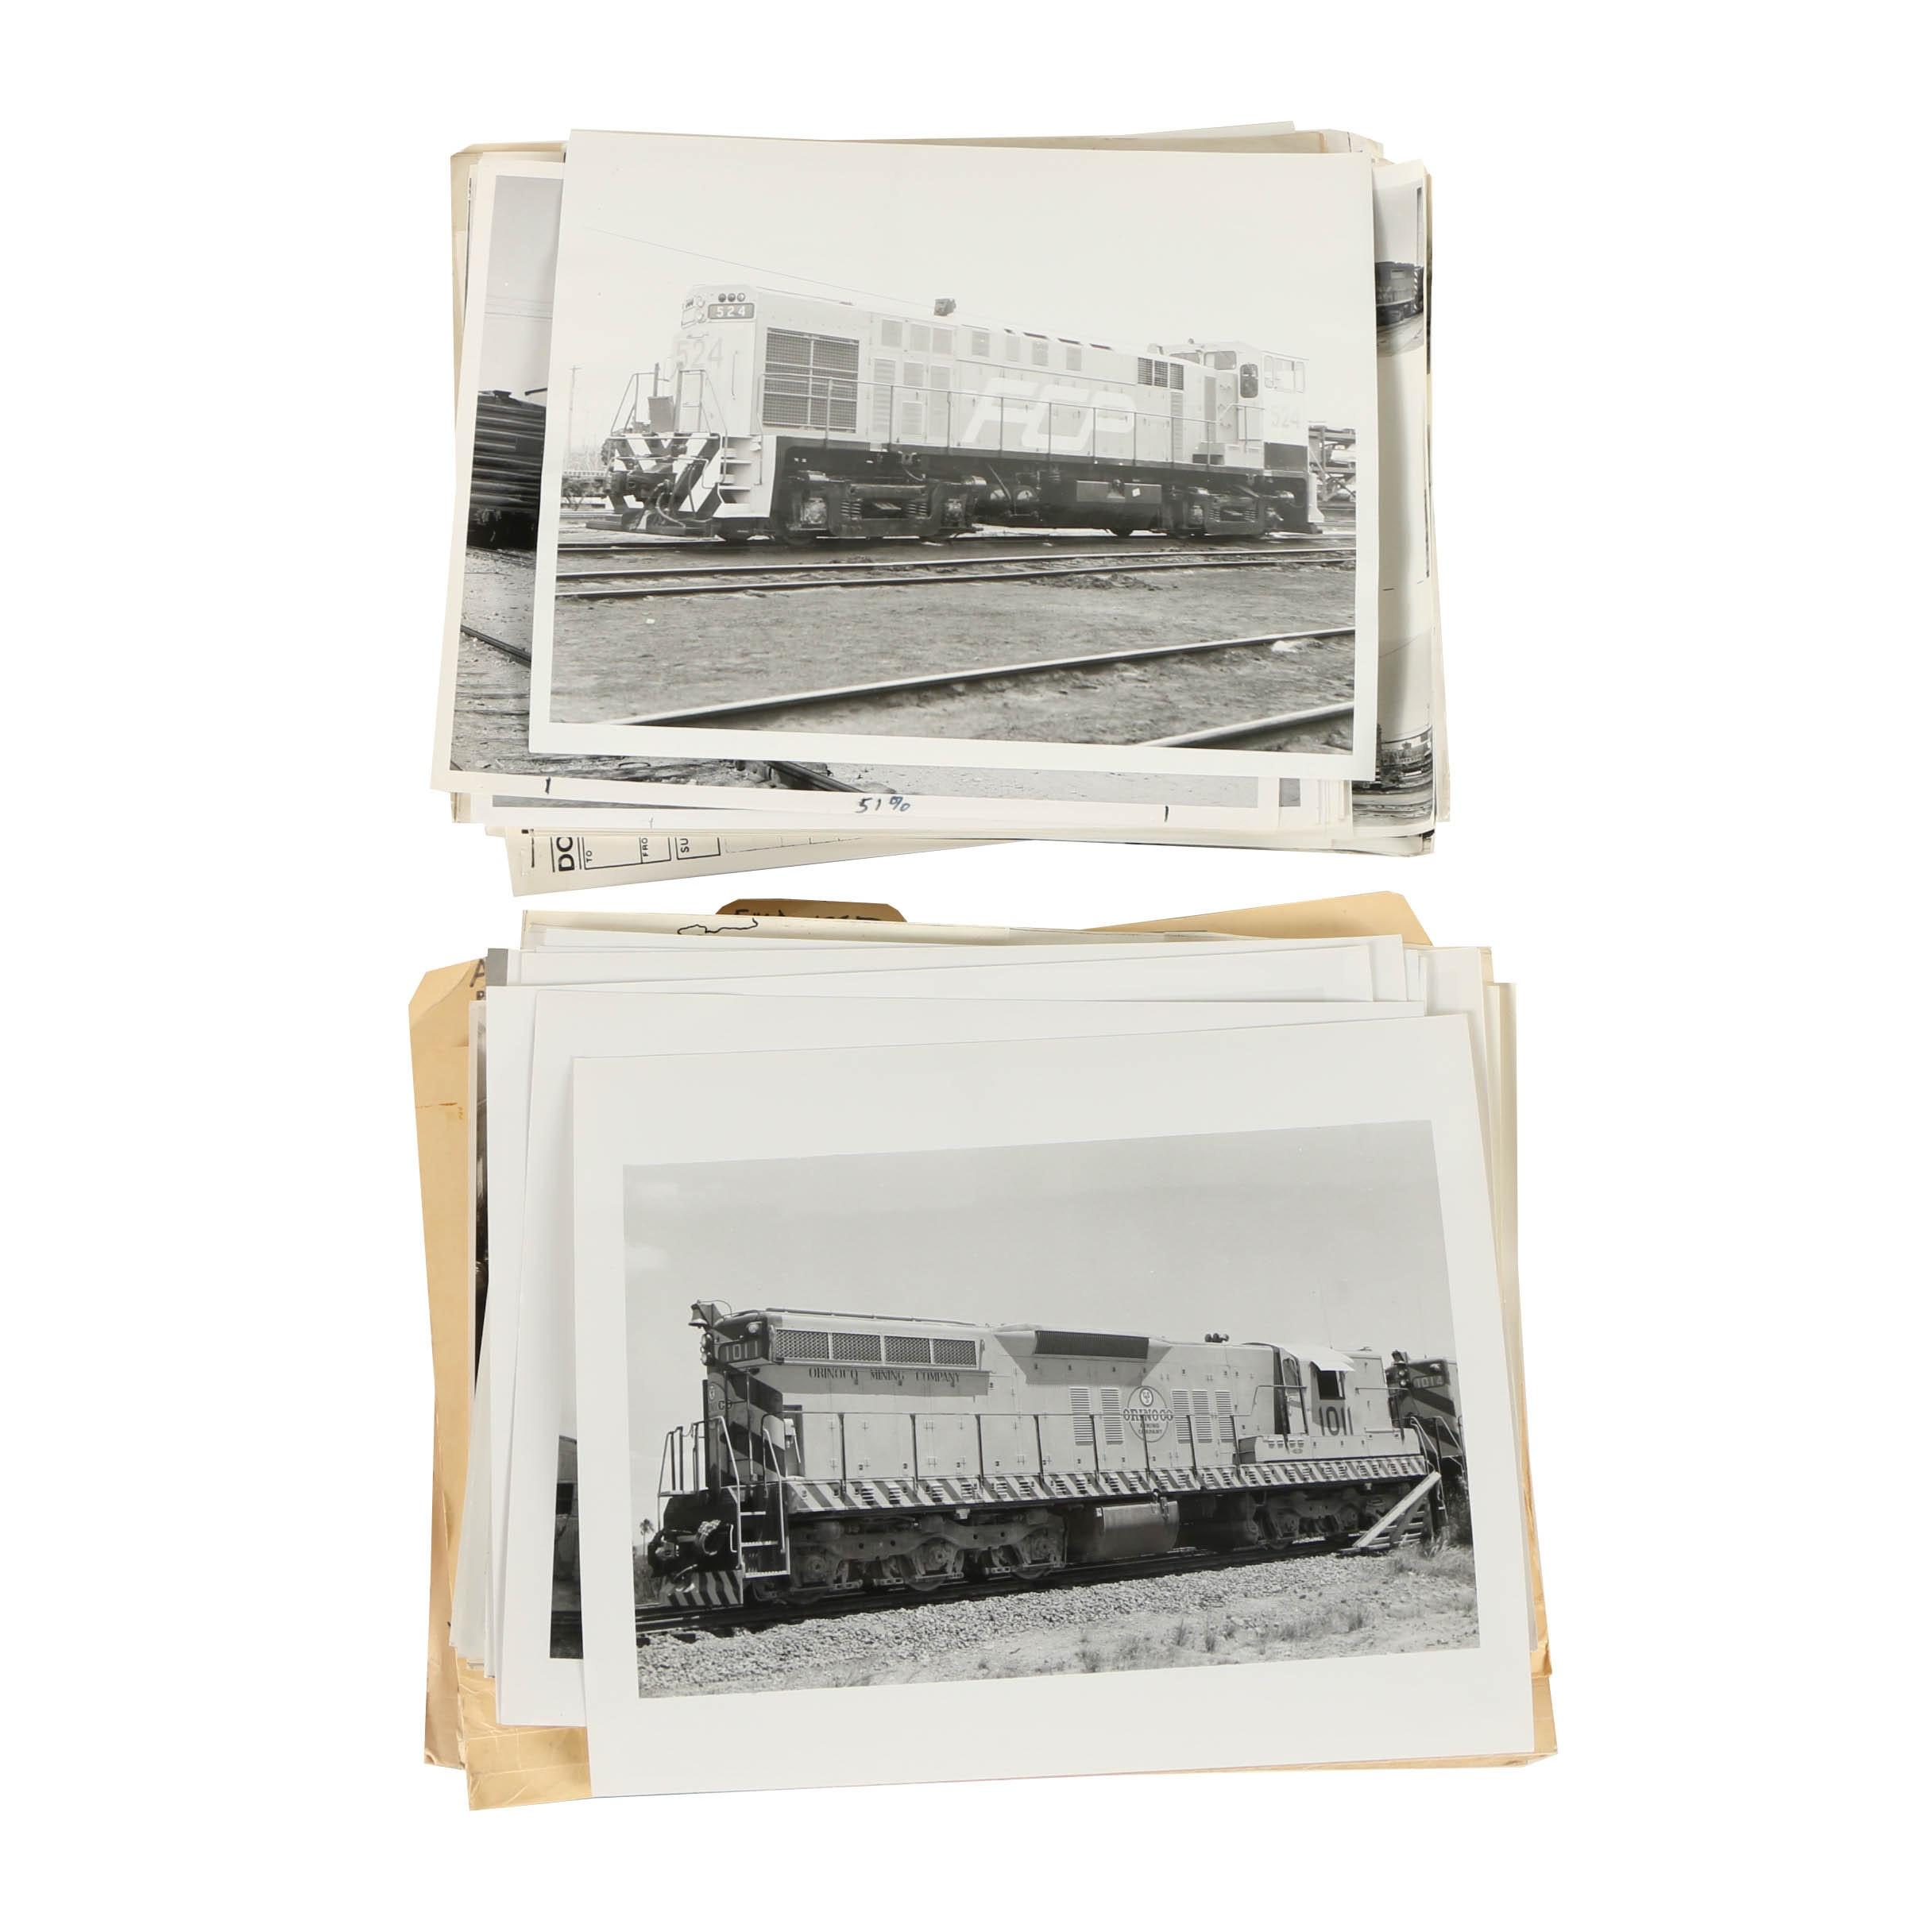 Late 20th Century Train Photographs and Ephemera